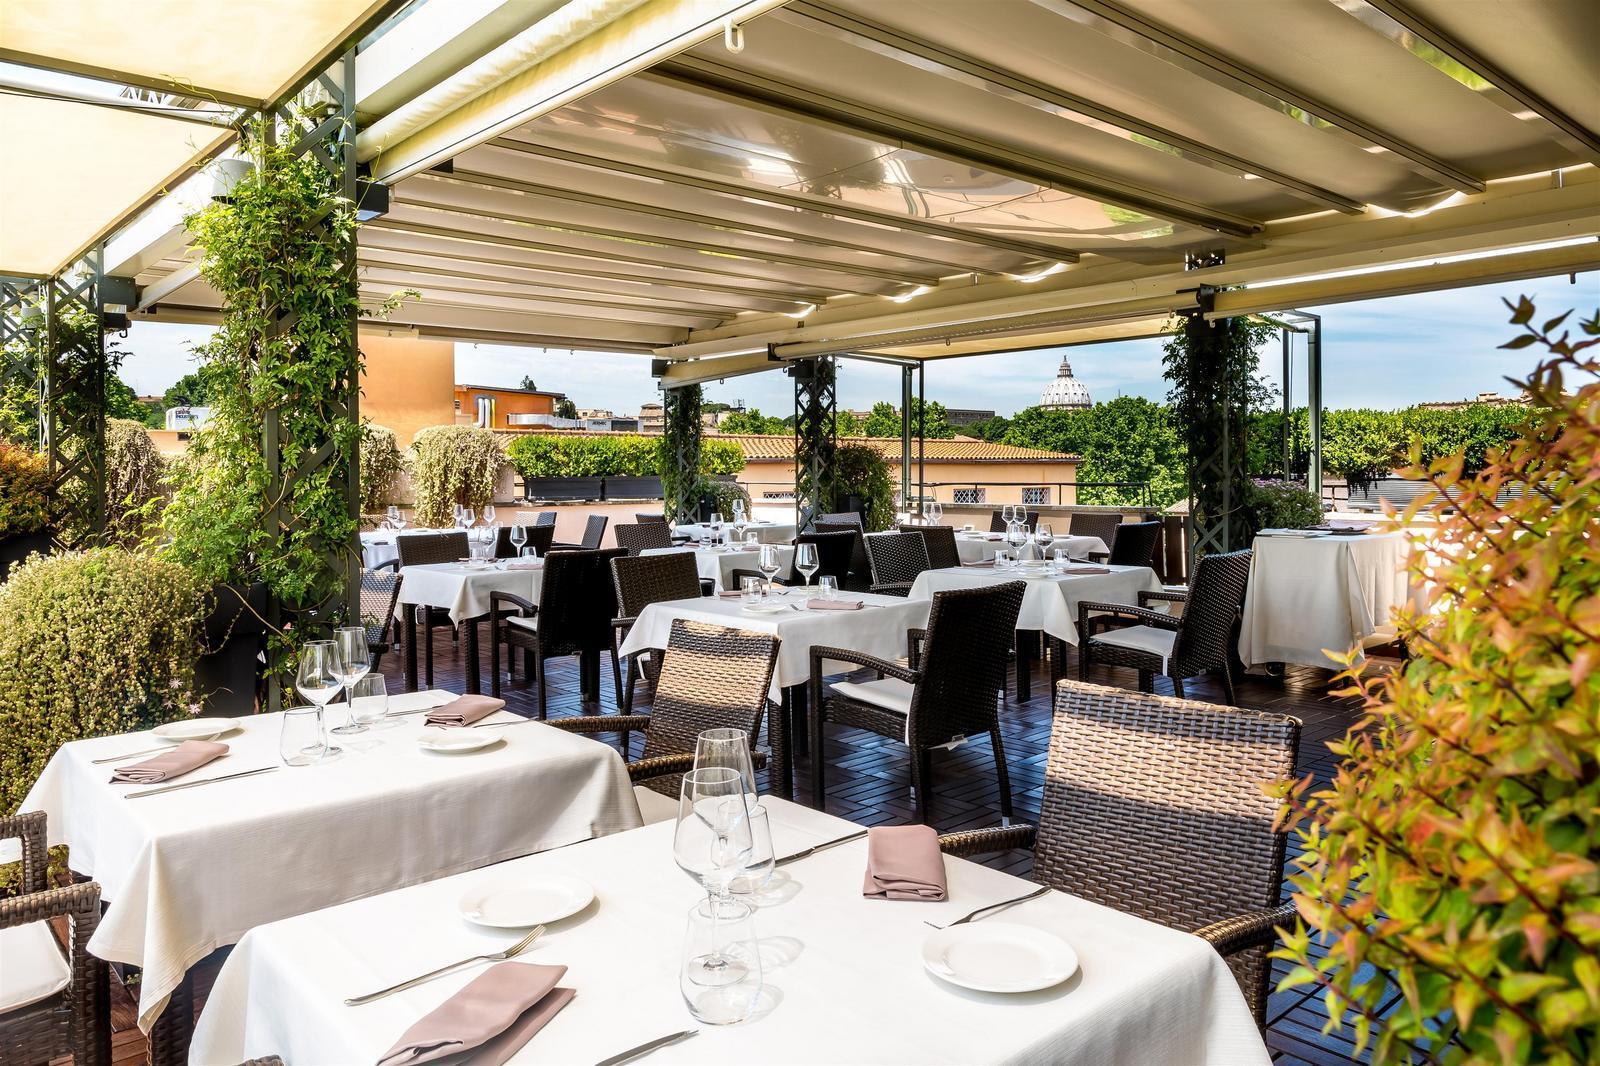 Roof terrace for Terrace restaurant menu